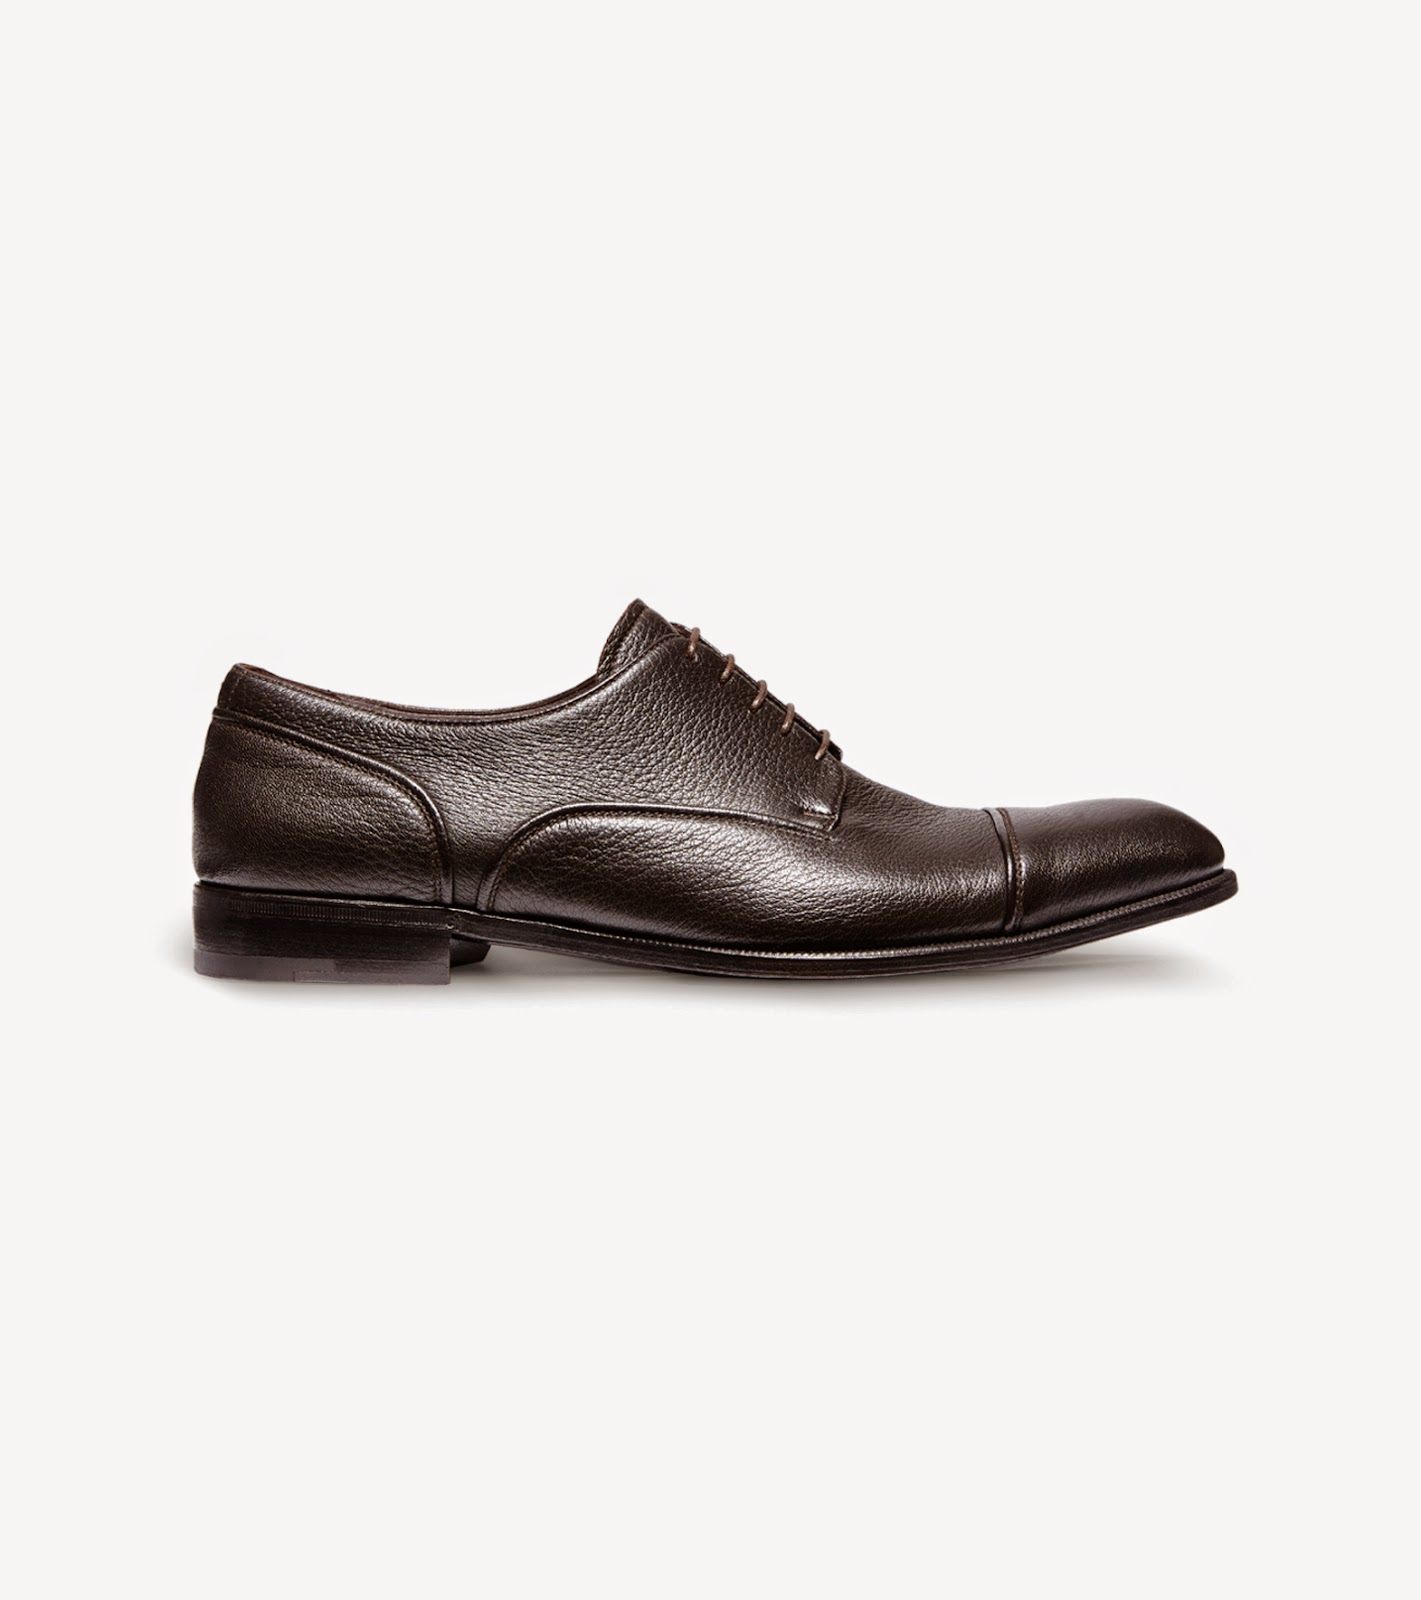 cea5188f2e4 Ermenegildo Zegna Flex Shoes - Comfort For Style Should Not Be Compromised